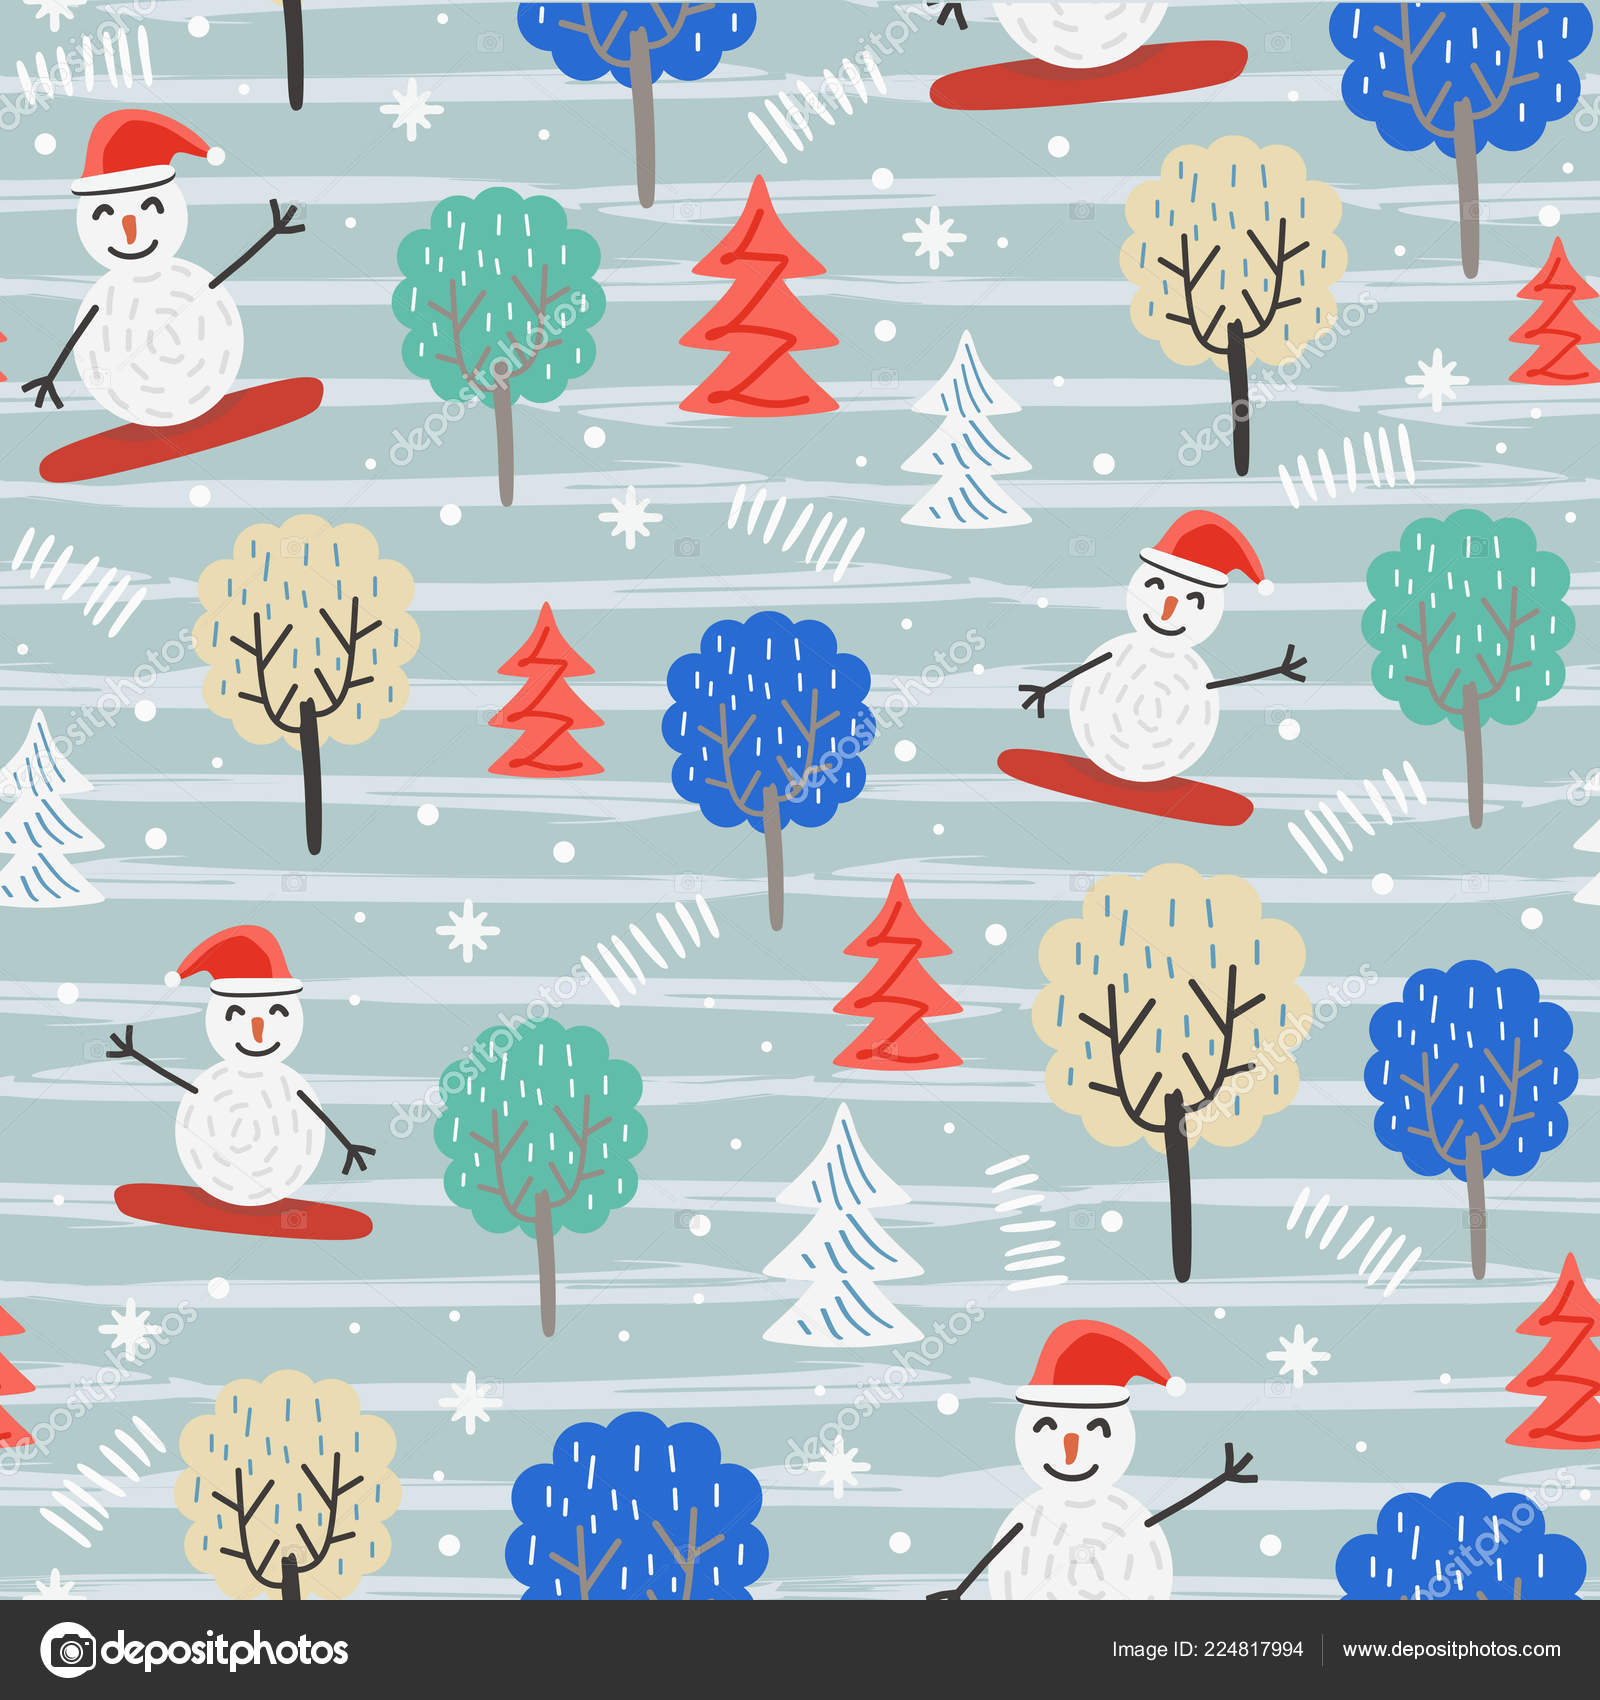 Fun Christmas Pattern Snowman Trees Vector Illustration